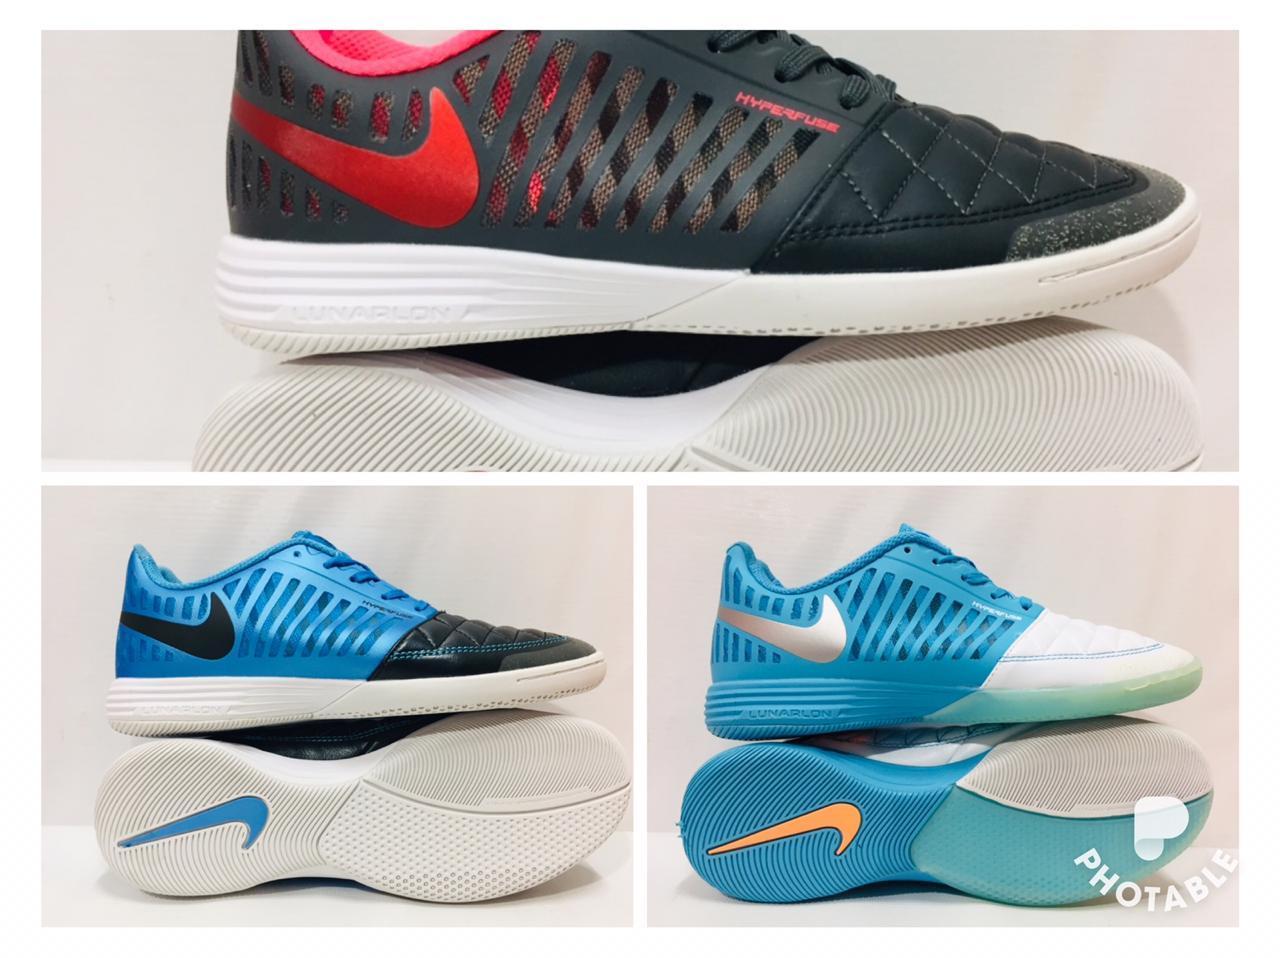 Бутсы-футзалки Nike Lunar Gato размеры 40-44 - фото 5